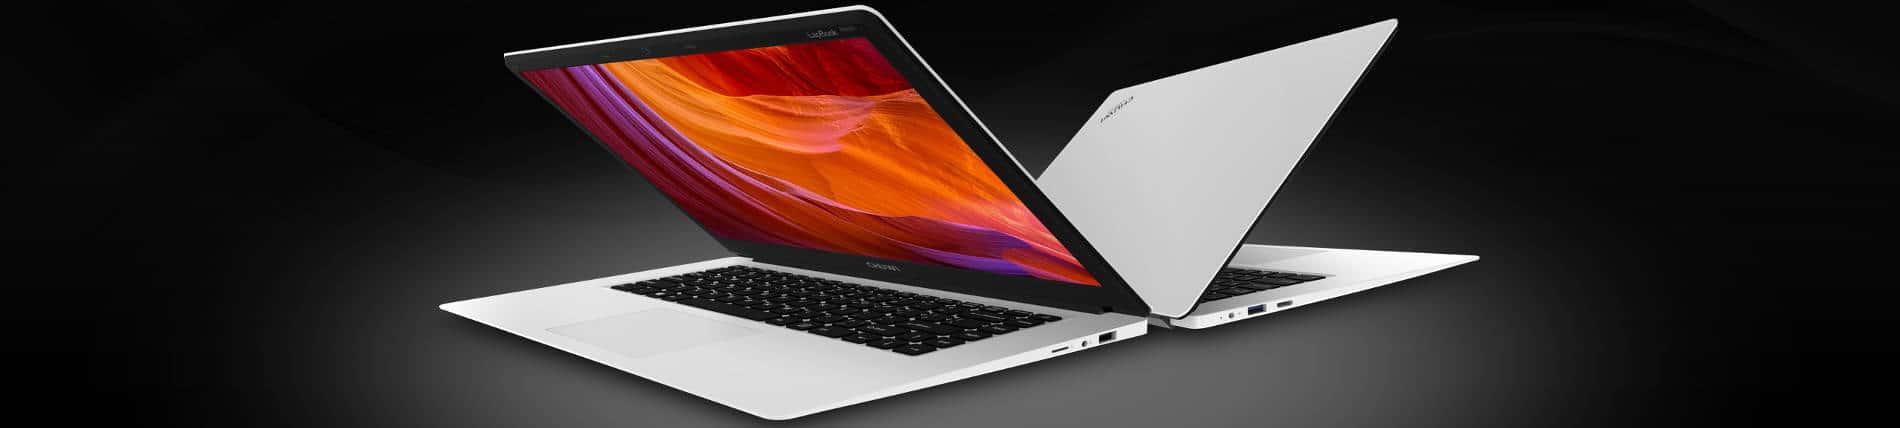 Chuwi LapBook en test sur avis-express